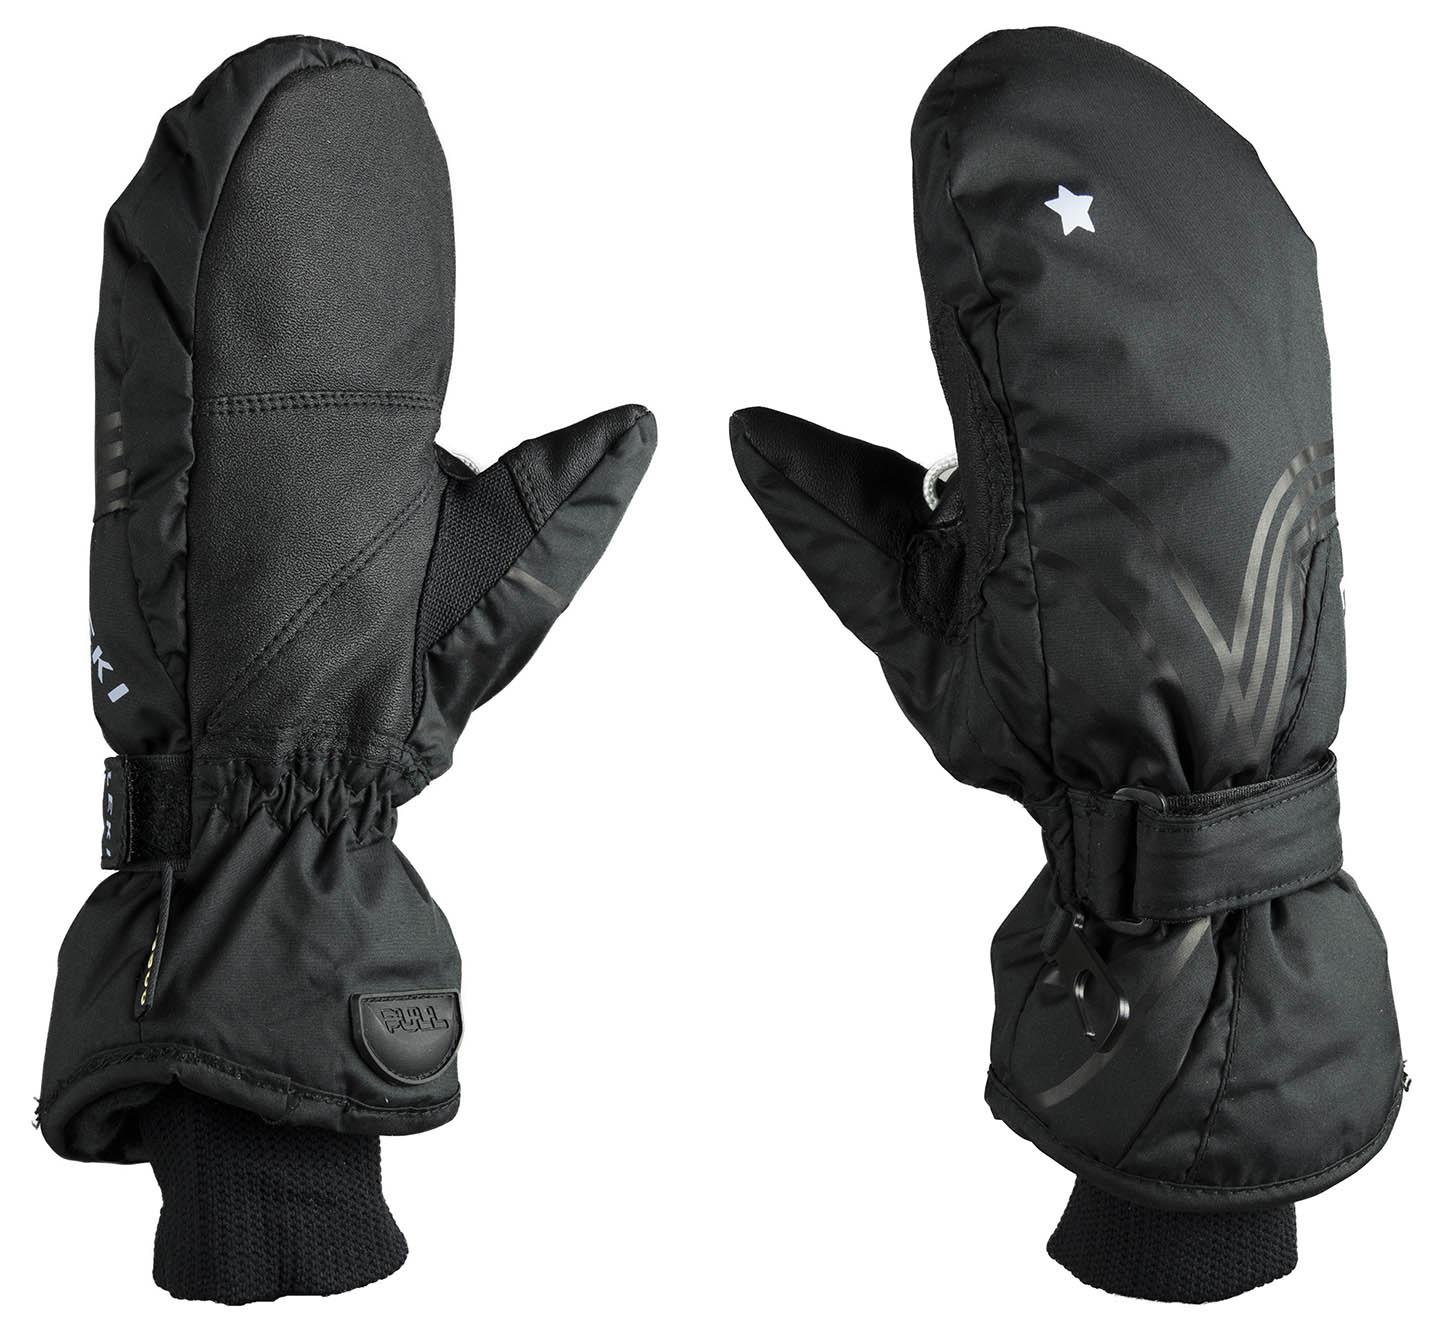 Juniorské rukavice Leki HS SnowStar S mitten